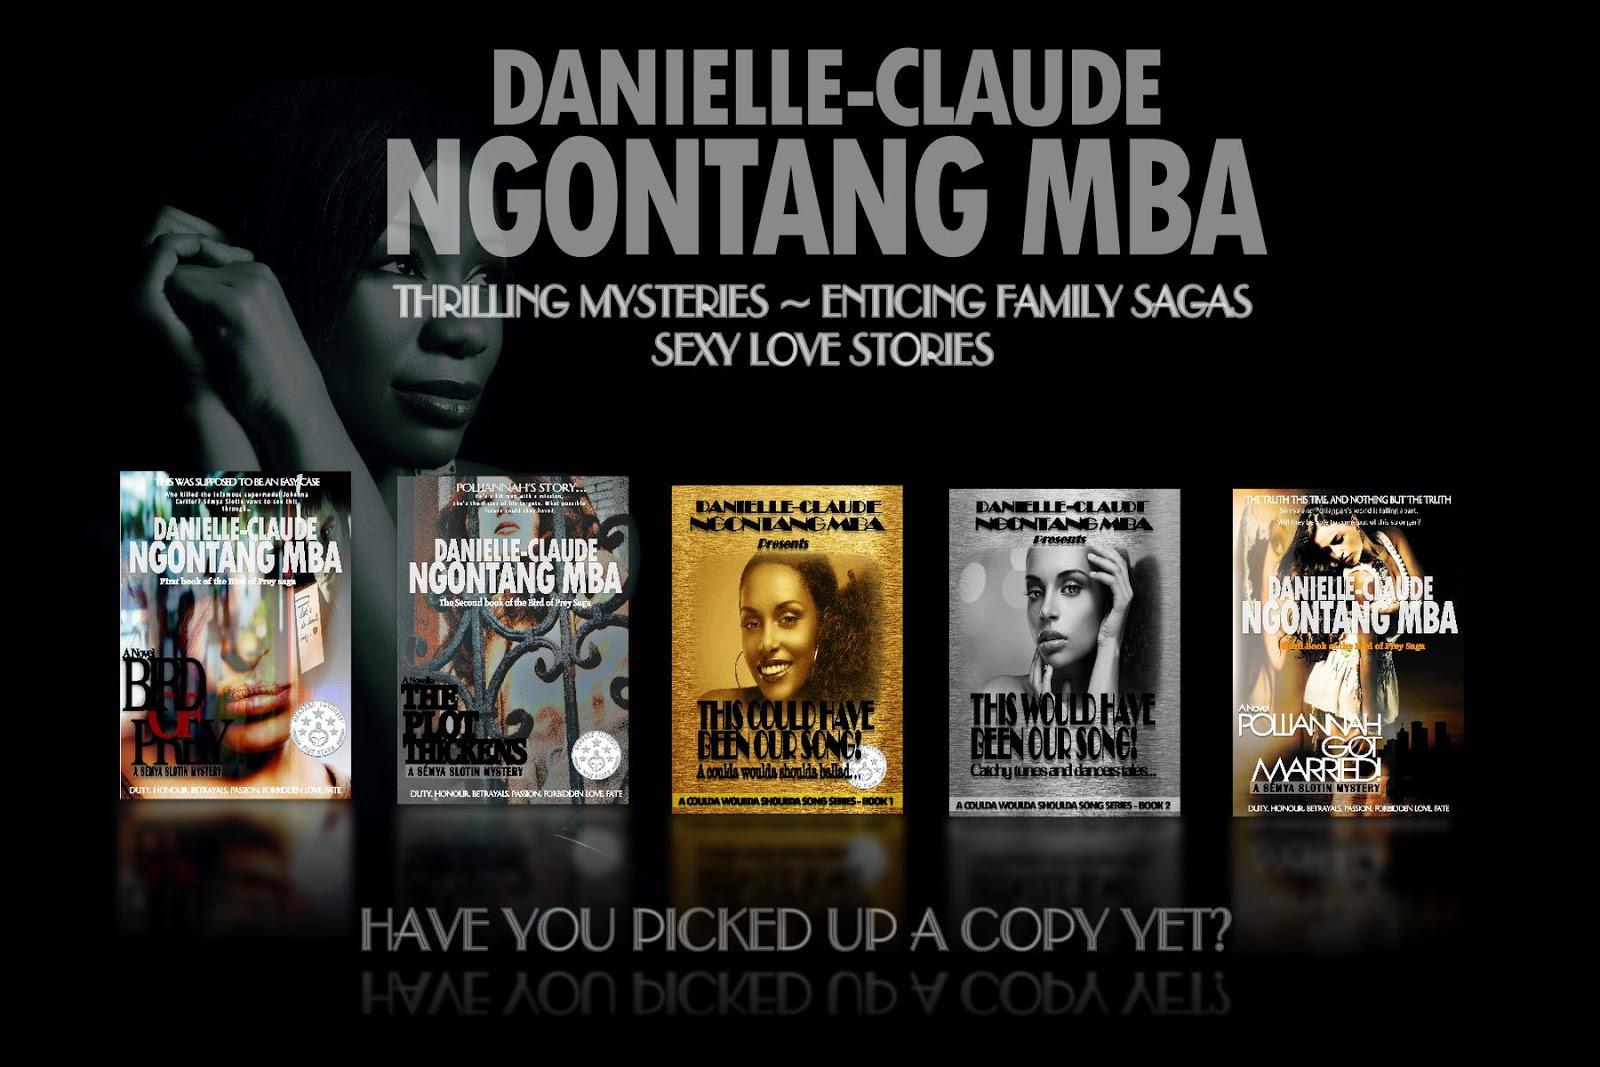 http://www.iamdanielle-claude.com/